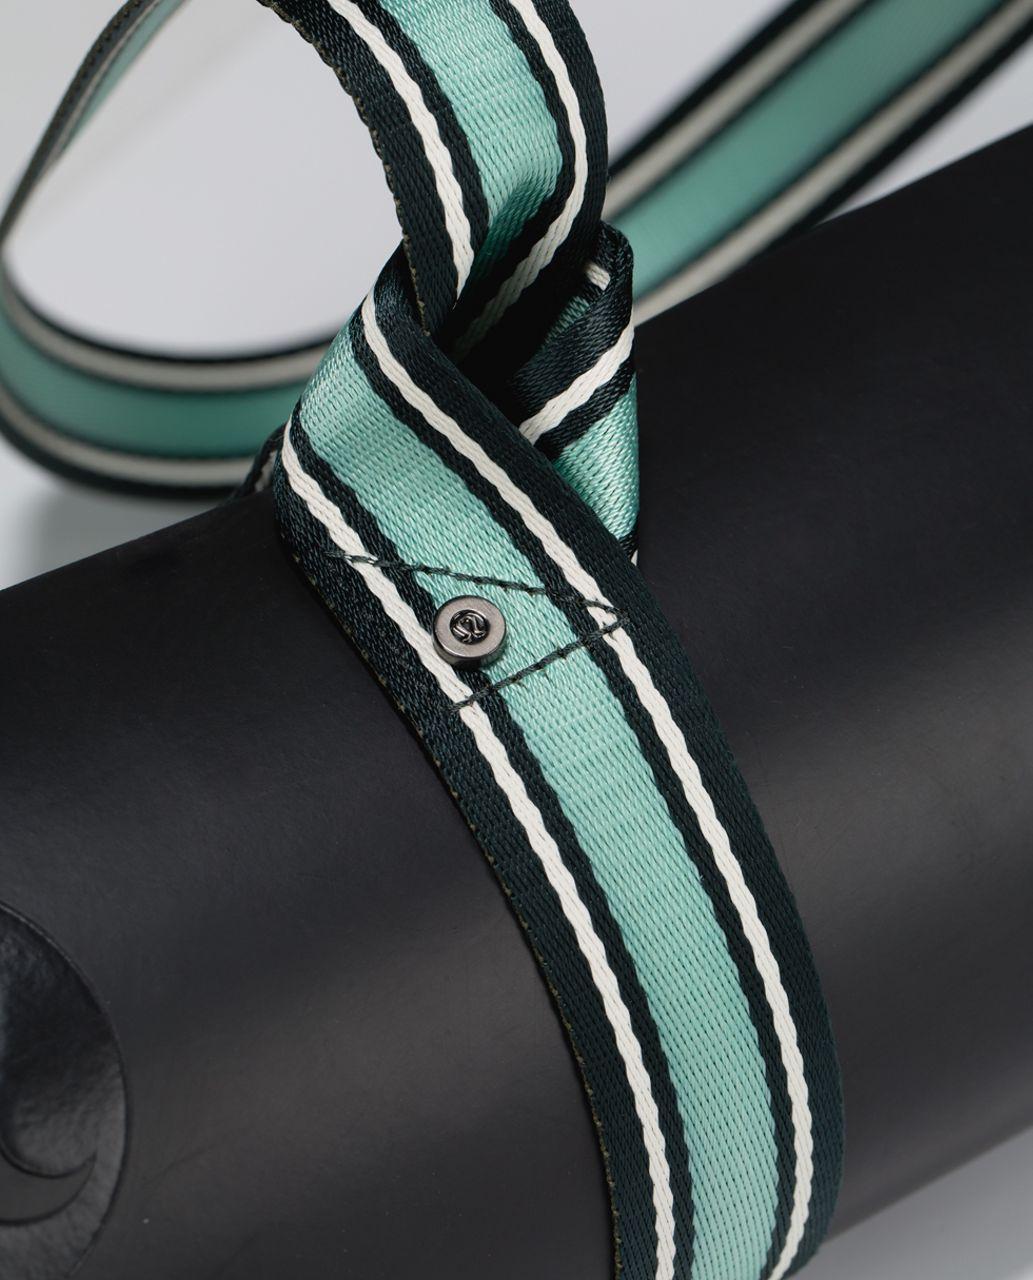 Lululemon Loop It Up Mat Strap - Fuel Green / Ghost / Toothpaste